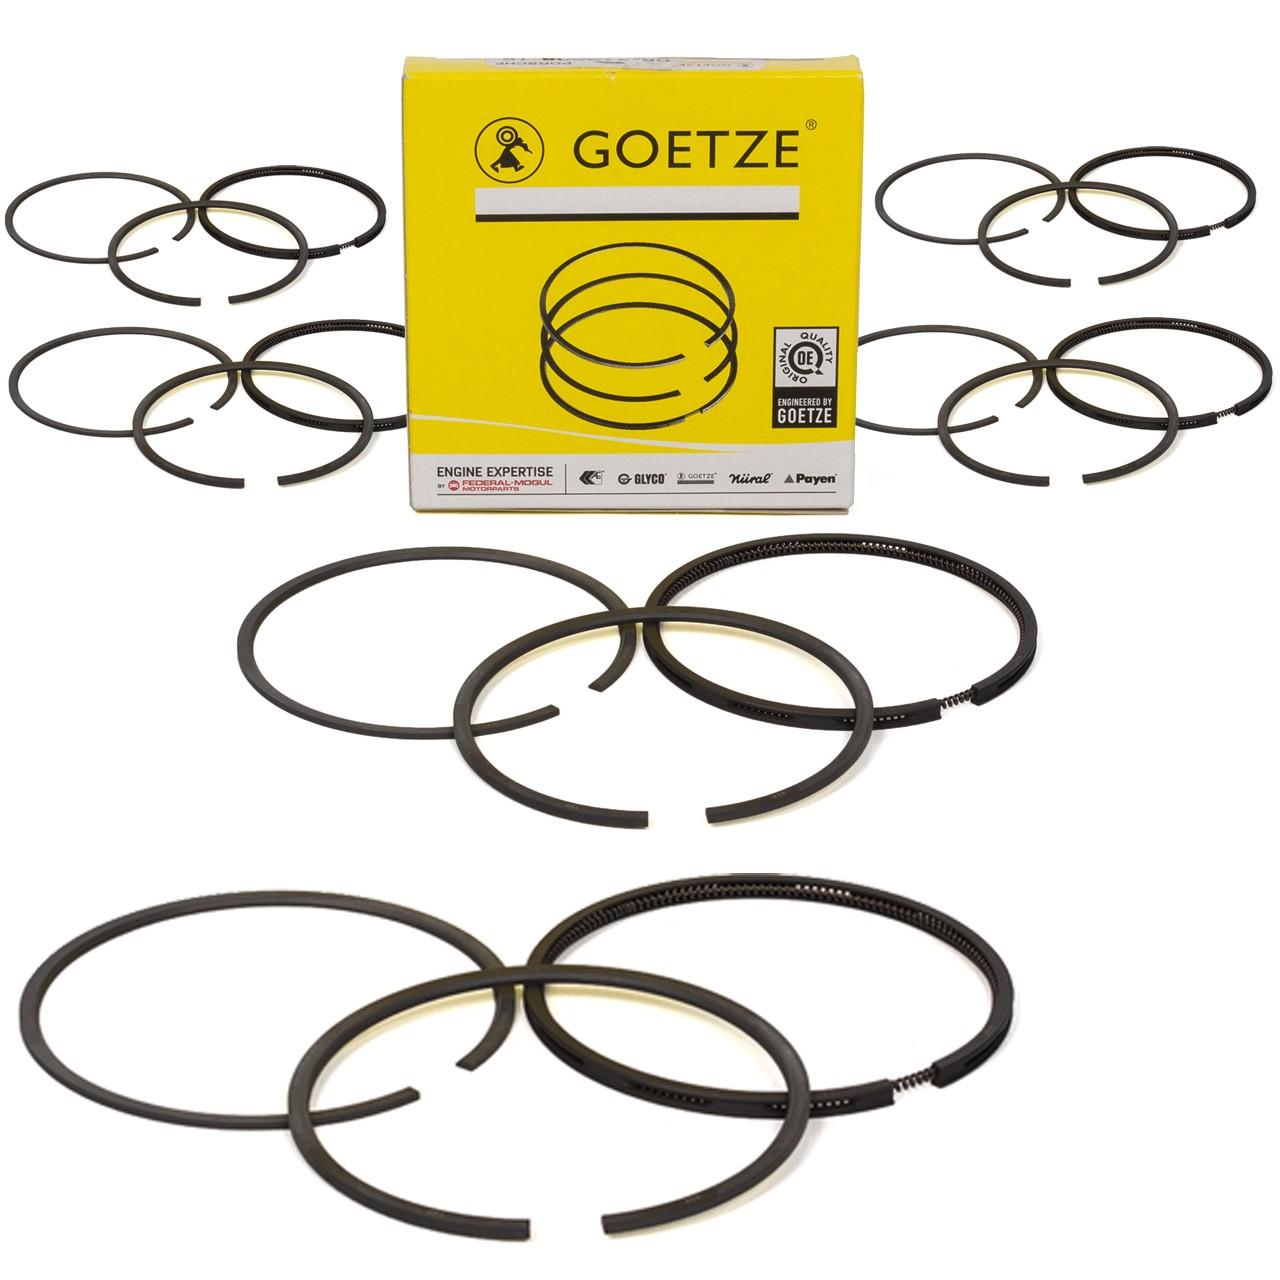 6x GOETZE 08-319500-10 Kolbenringsatz PORSCHE 911 2.2 2.3 T/E/S 69-73 + 912 1.6